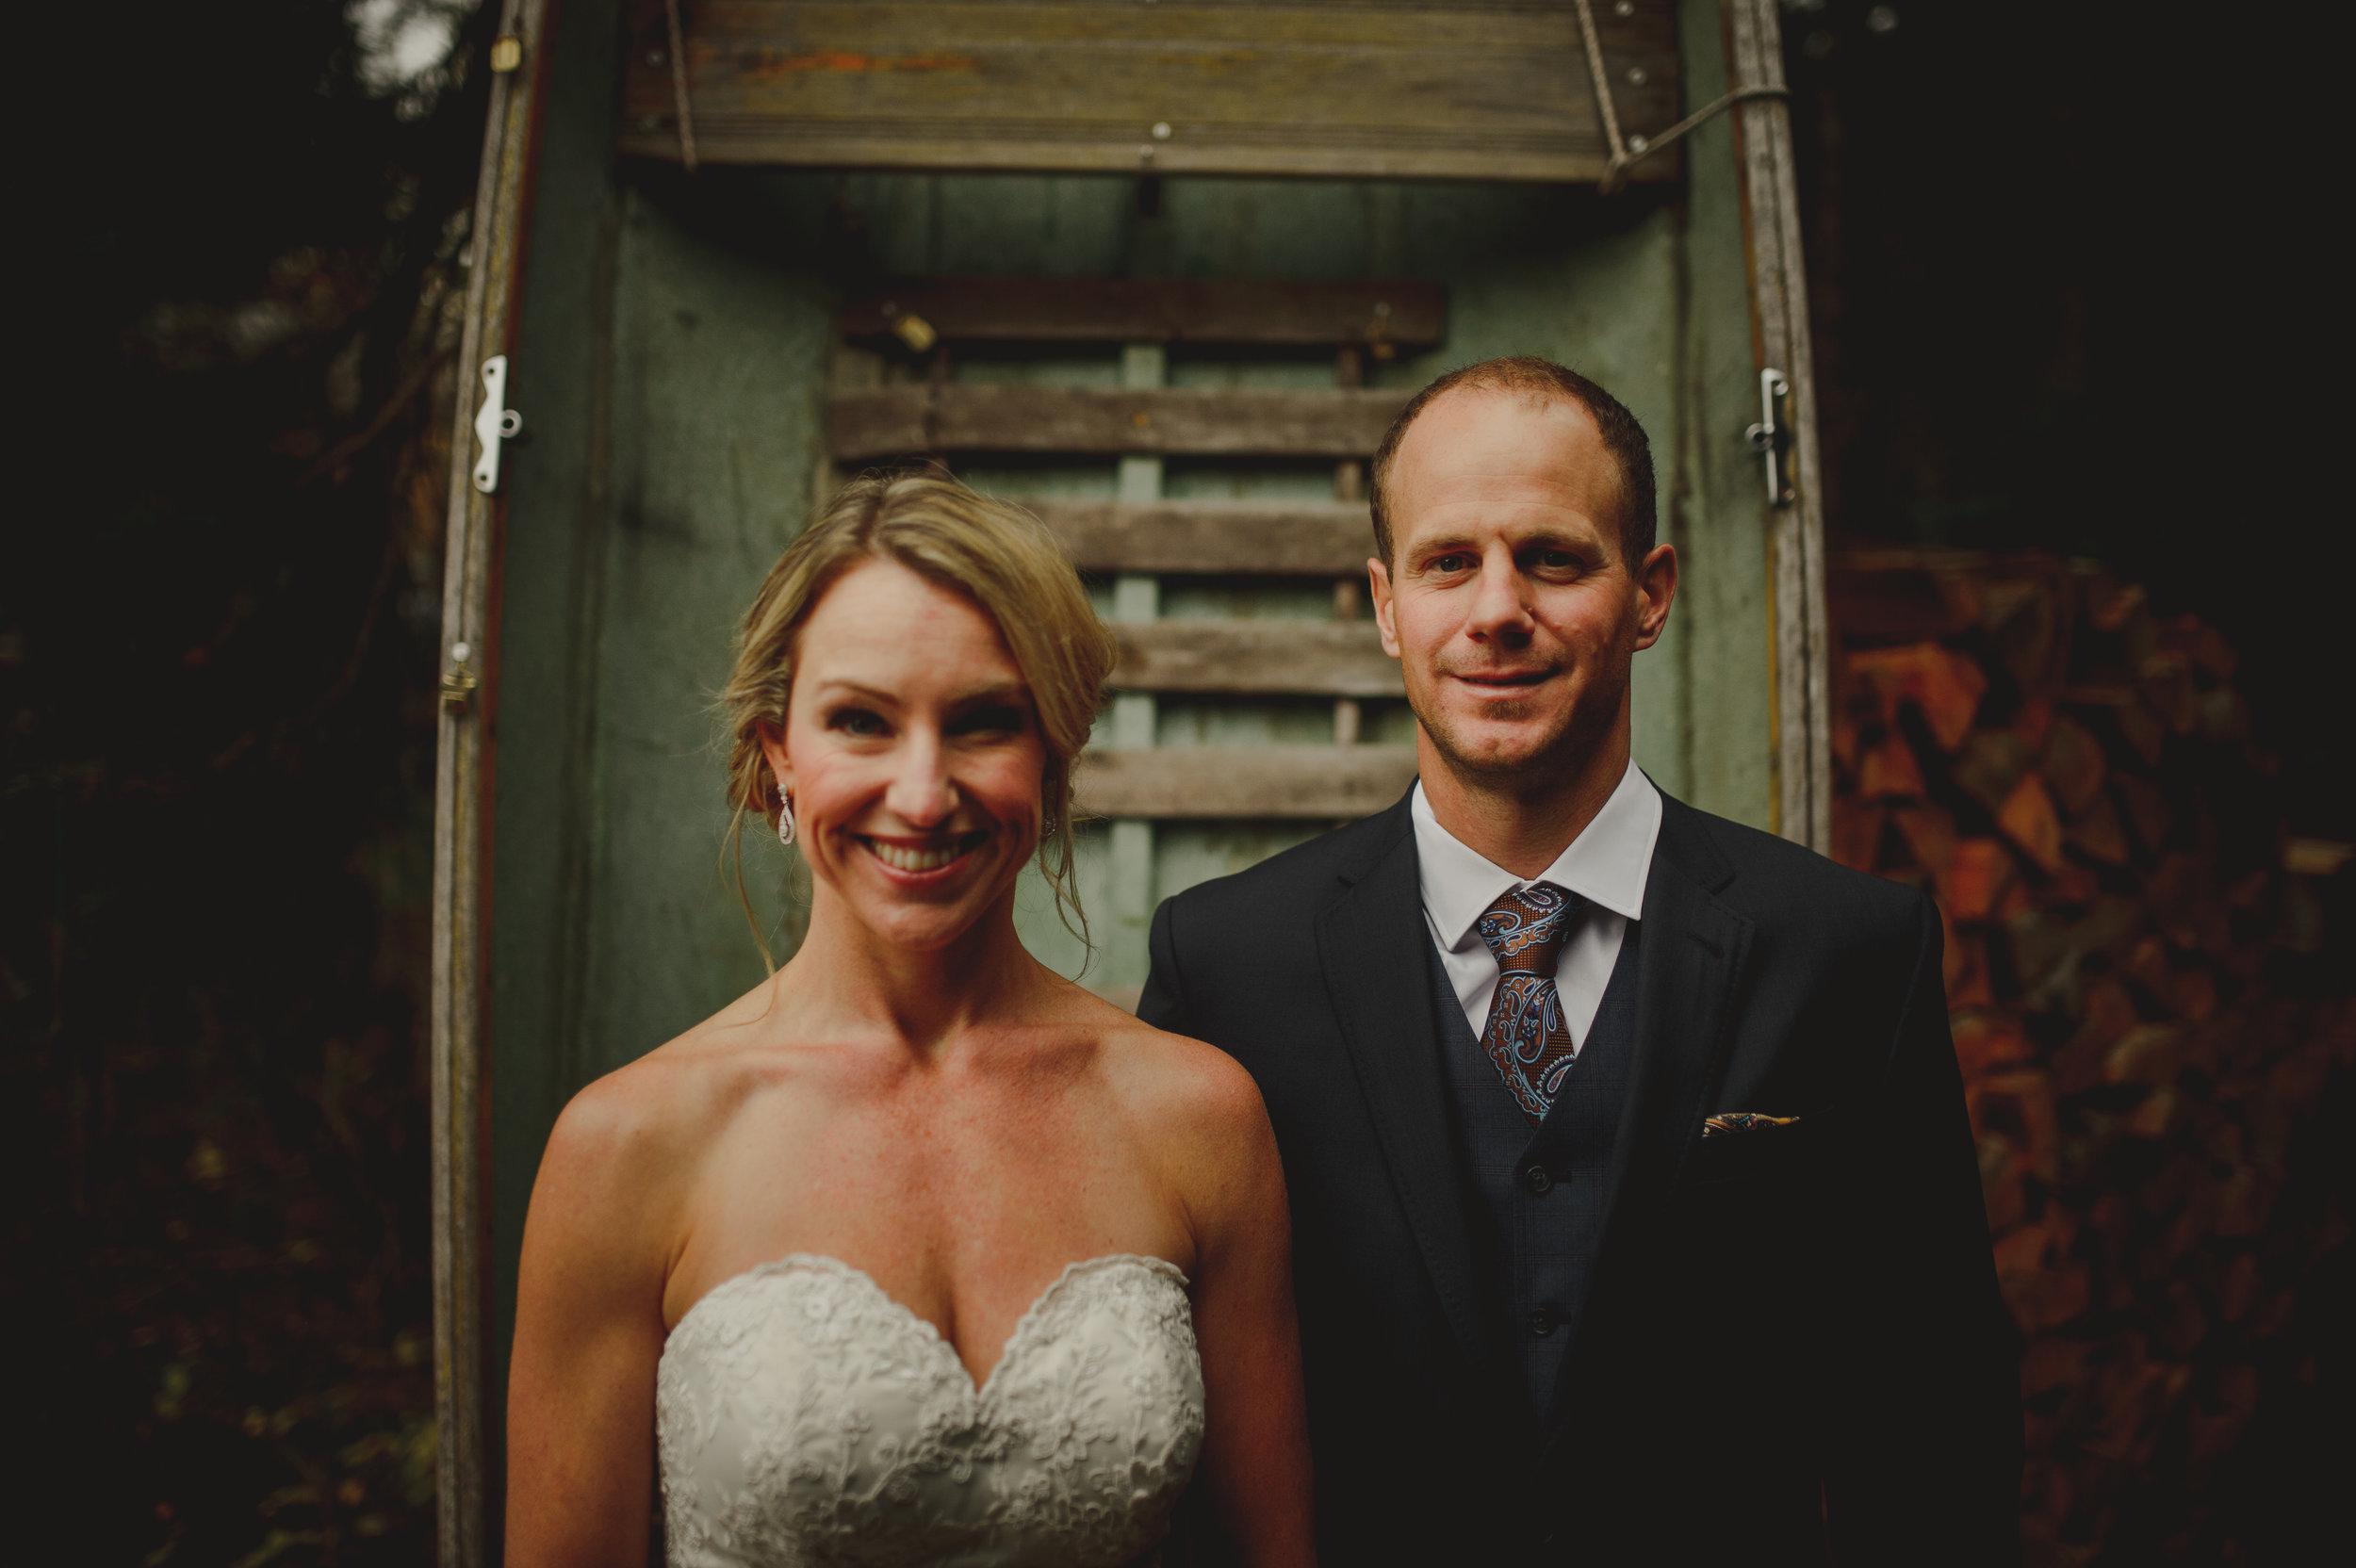 Banff-Wedding-Photographer-41.jpg